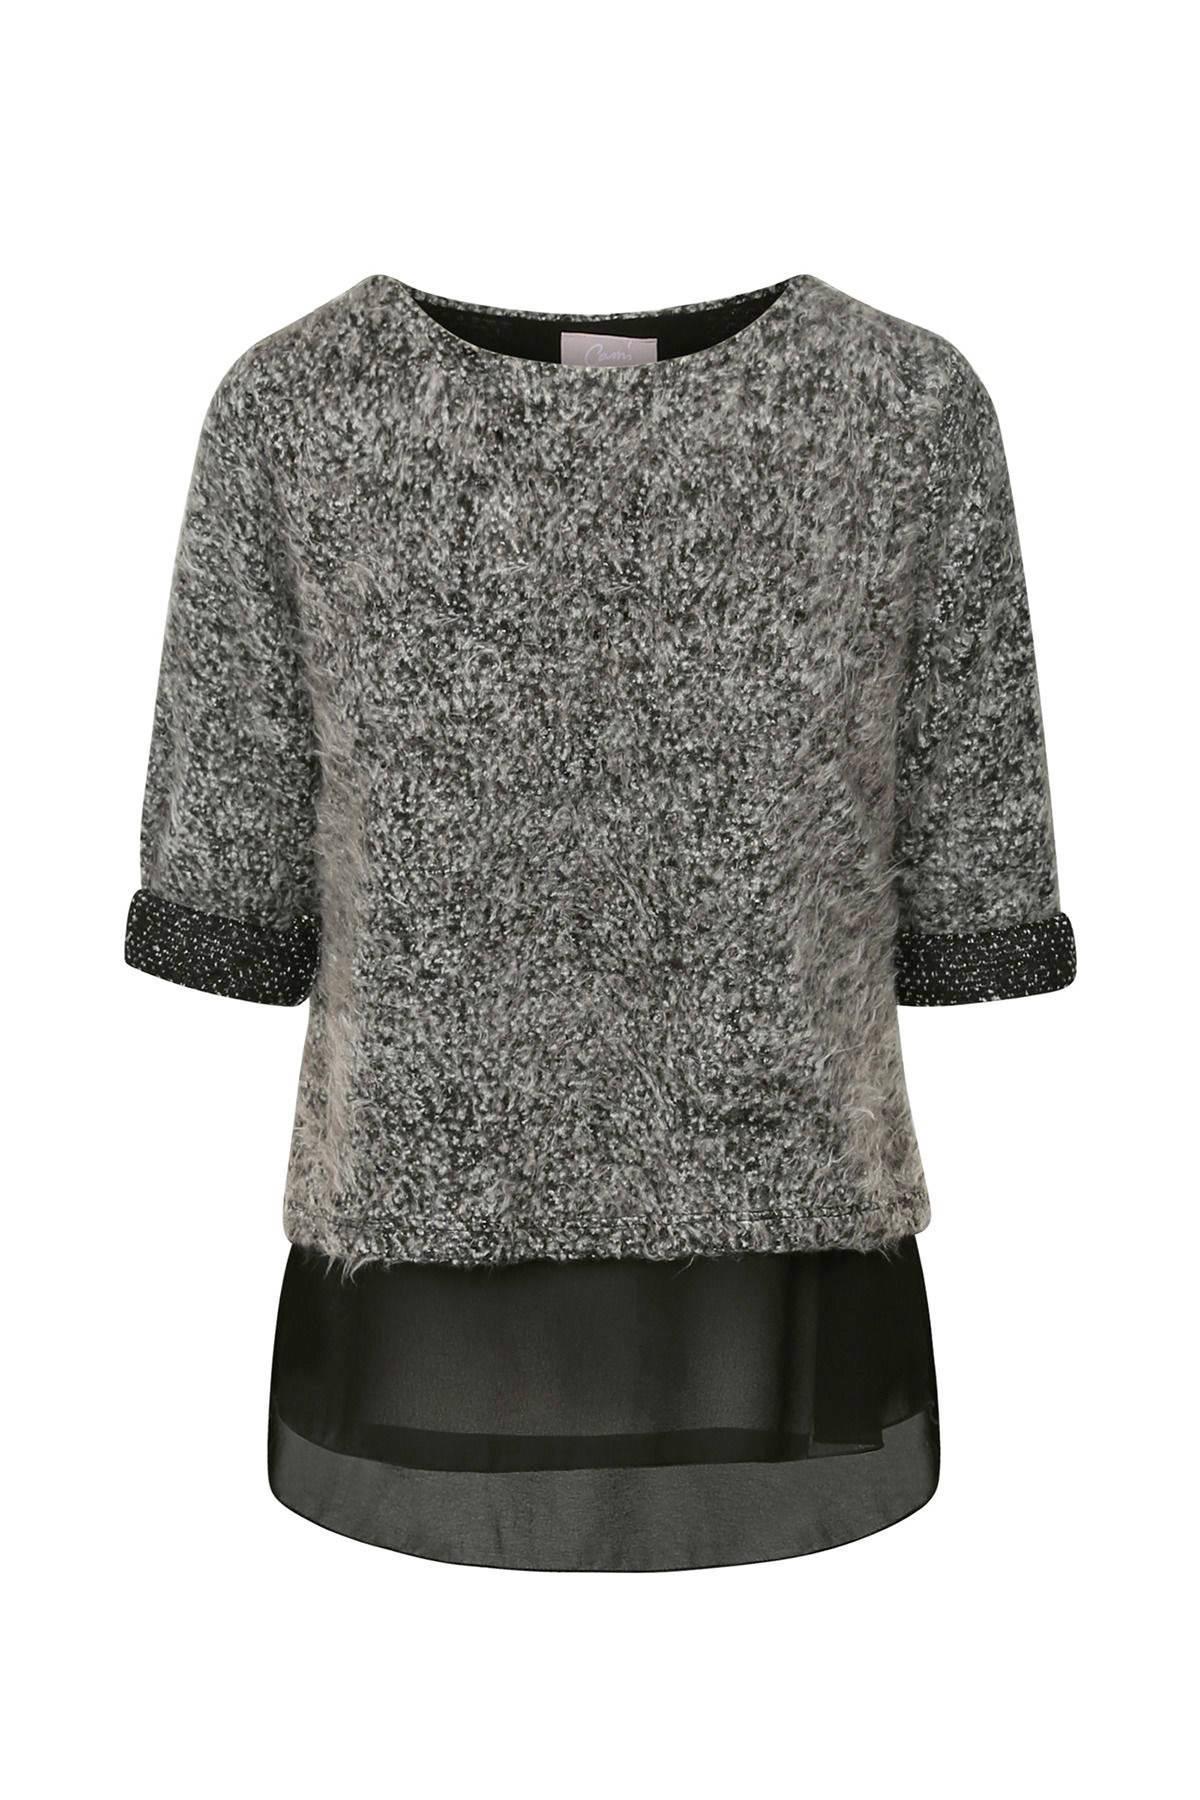 Cassis melée sweater met semi-transparant detail grijs (dames)